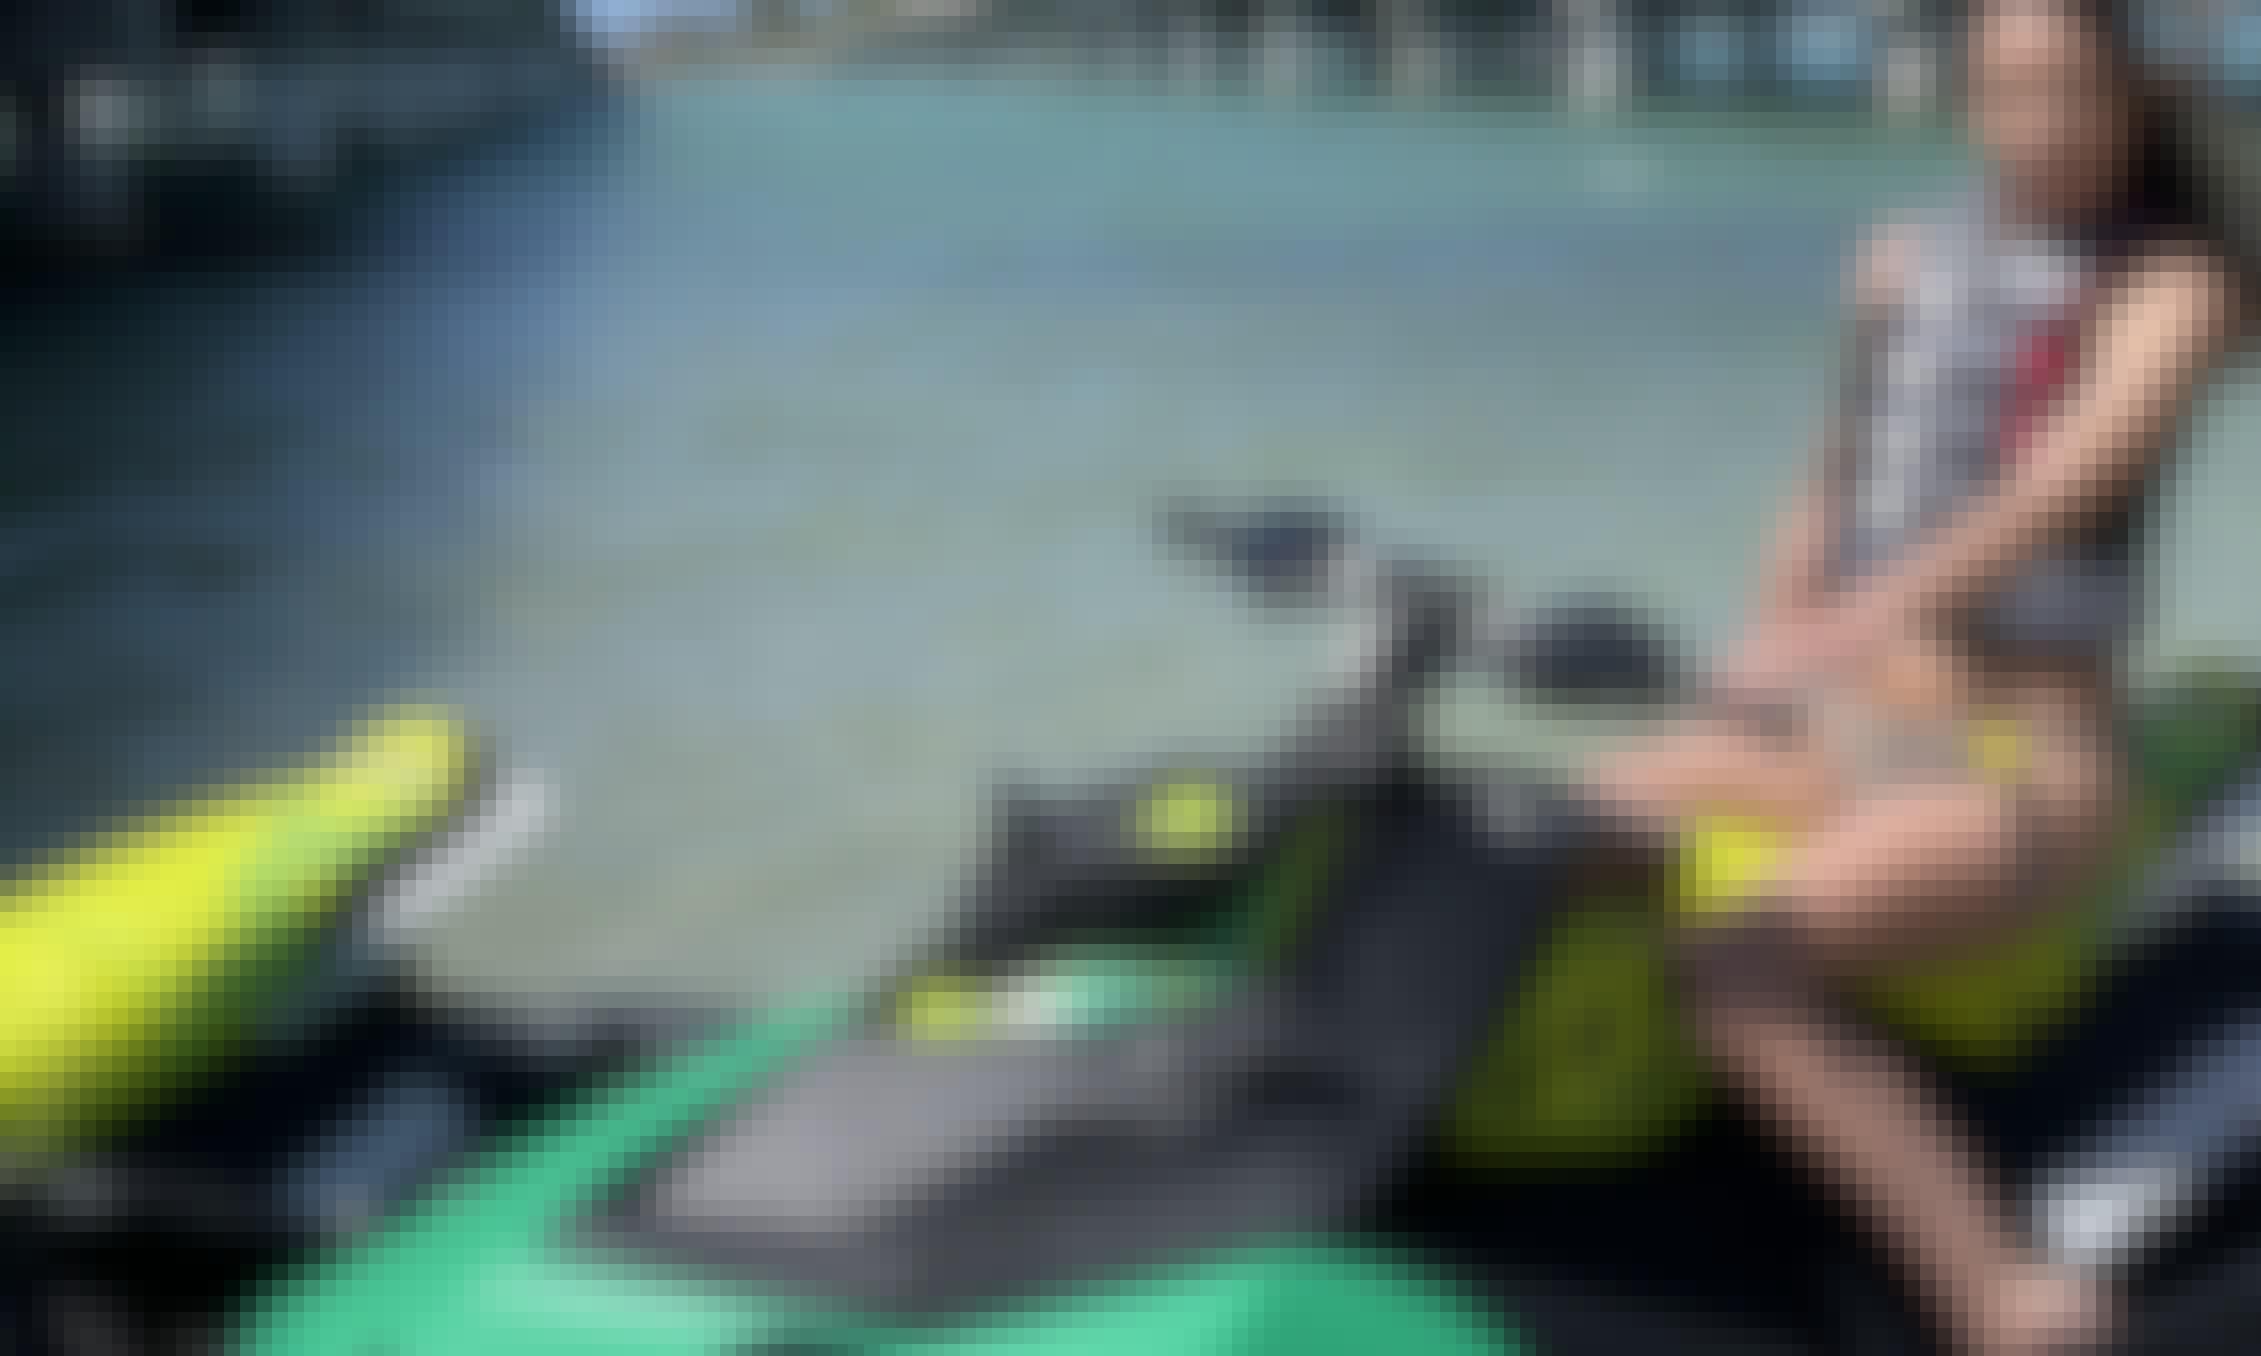 2021 Seadoo Trixx Jetski Rentals in Sarasota Bay